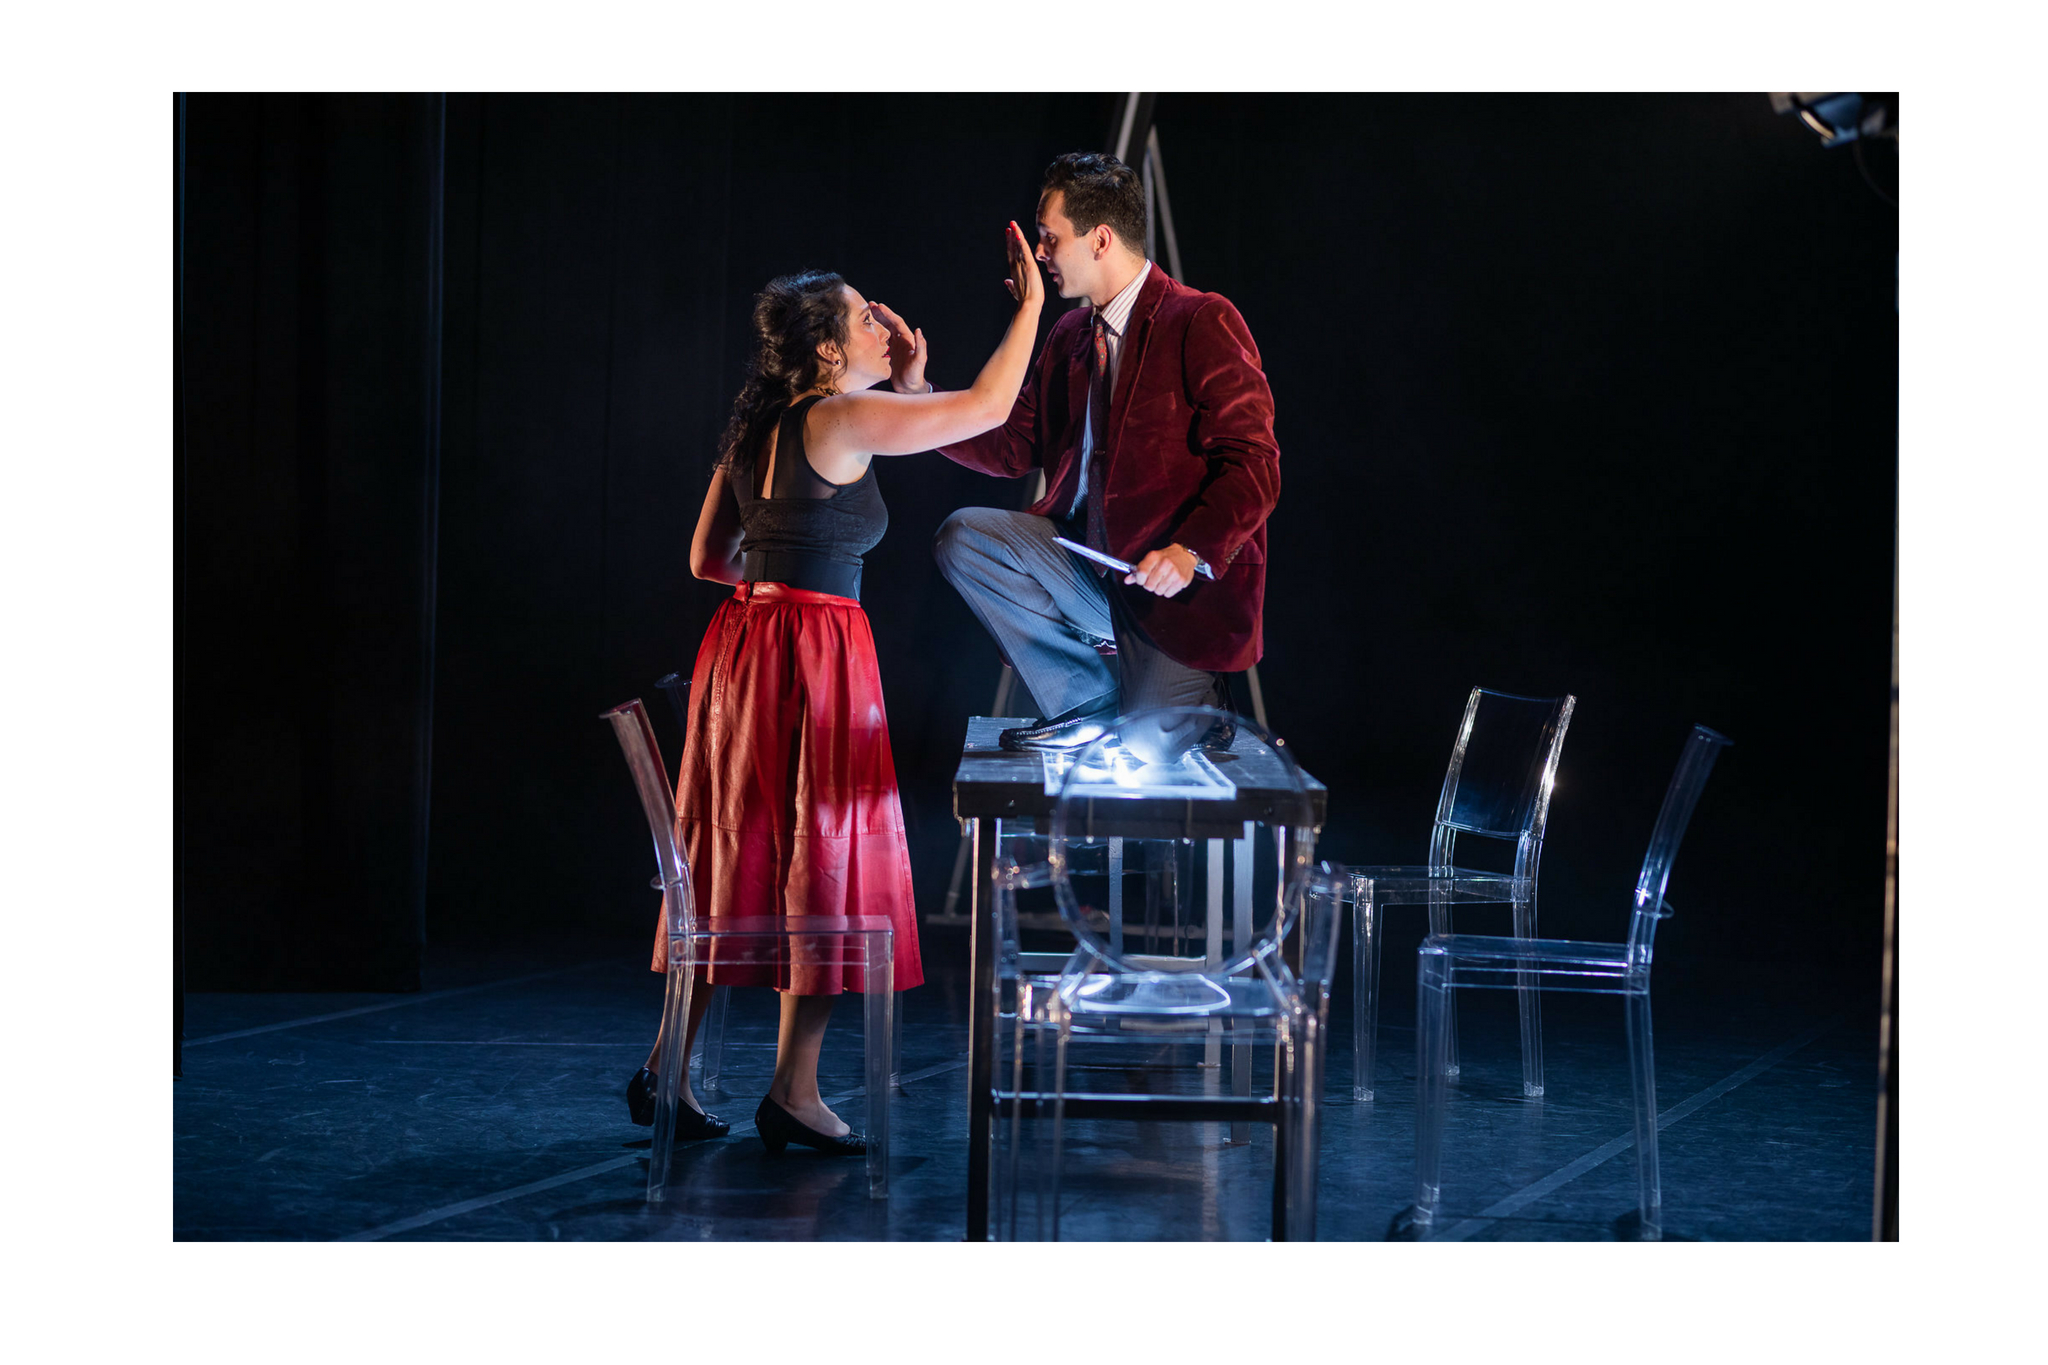 Stefanie Resnick (Lady Macbeth) and Billy Saunders, Jr. (Macbeth) in Macbeth, CSC2, 2018-Photo by Nile Hawver